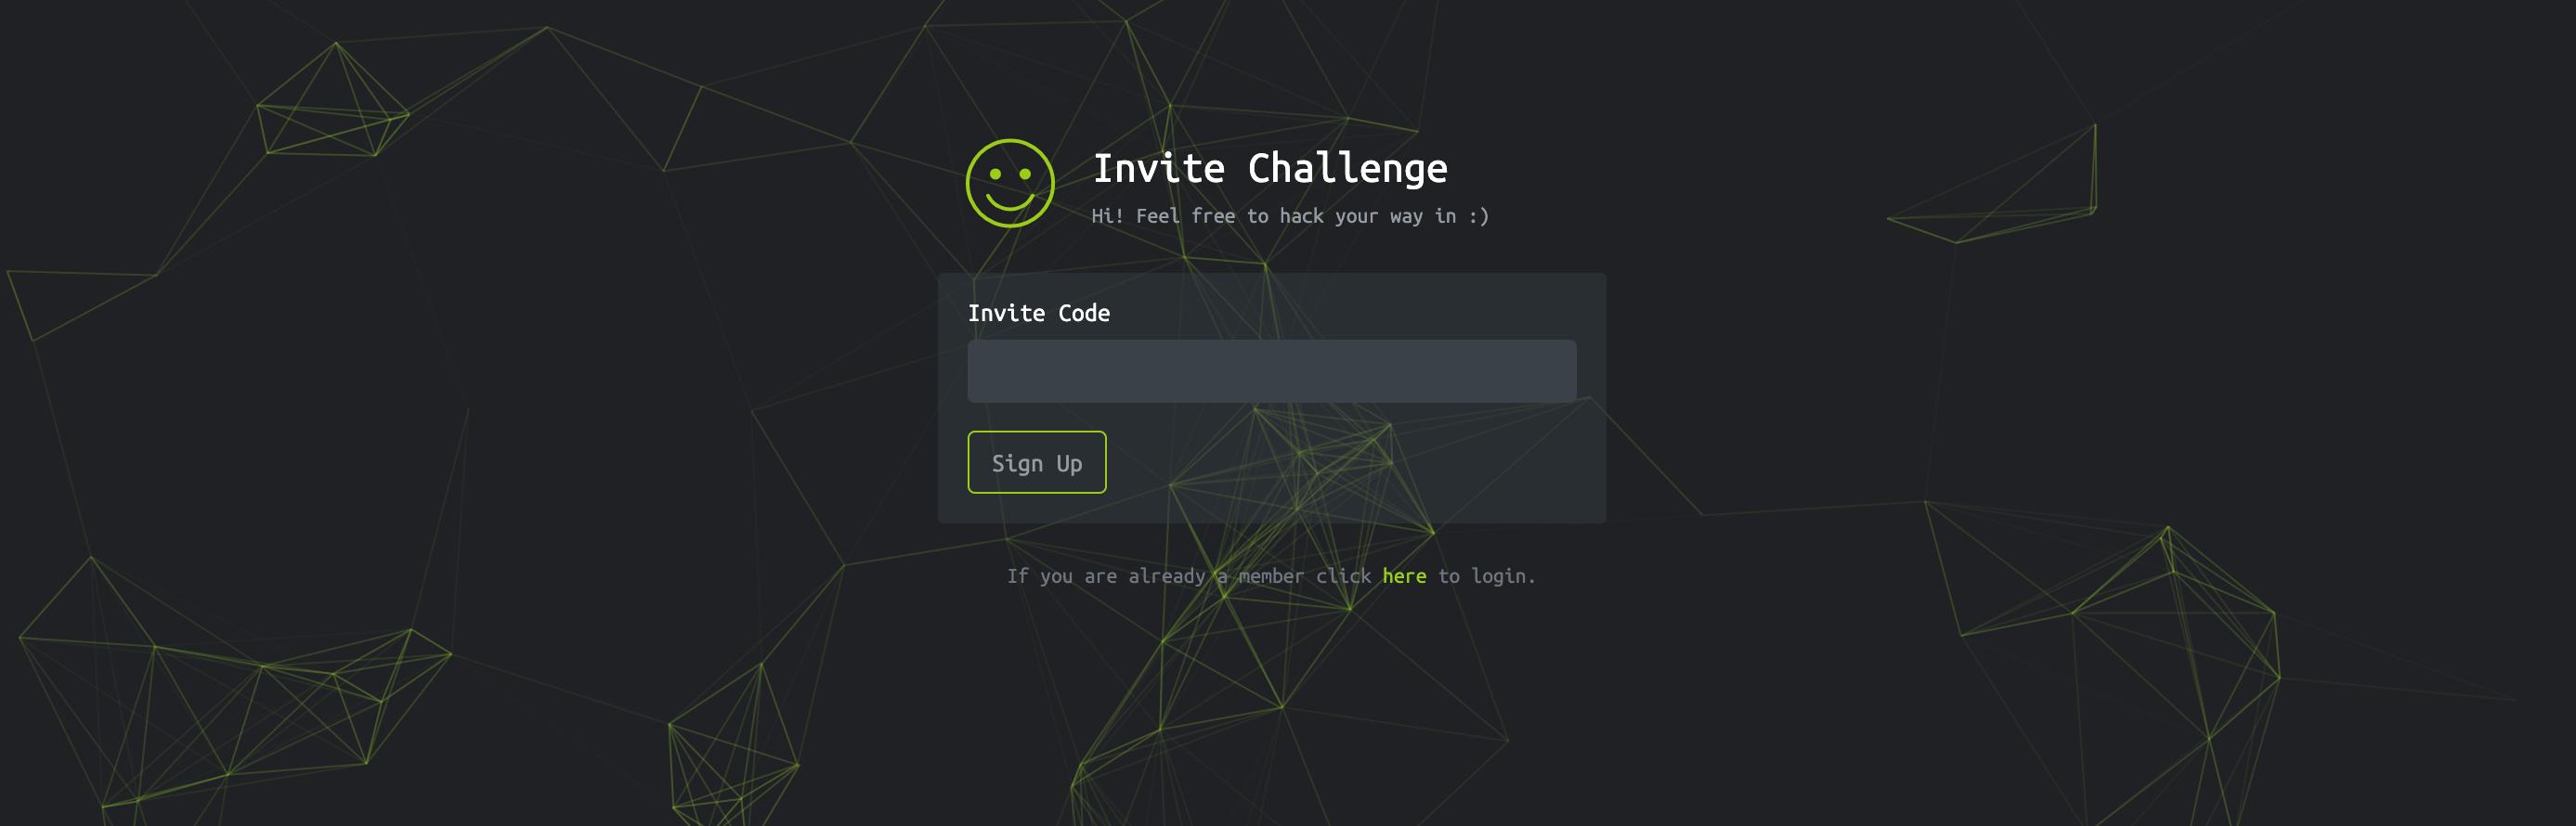 Invite Challenge.png